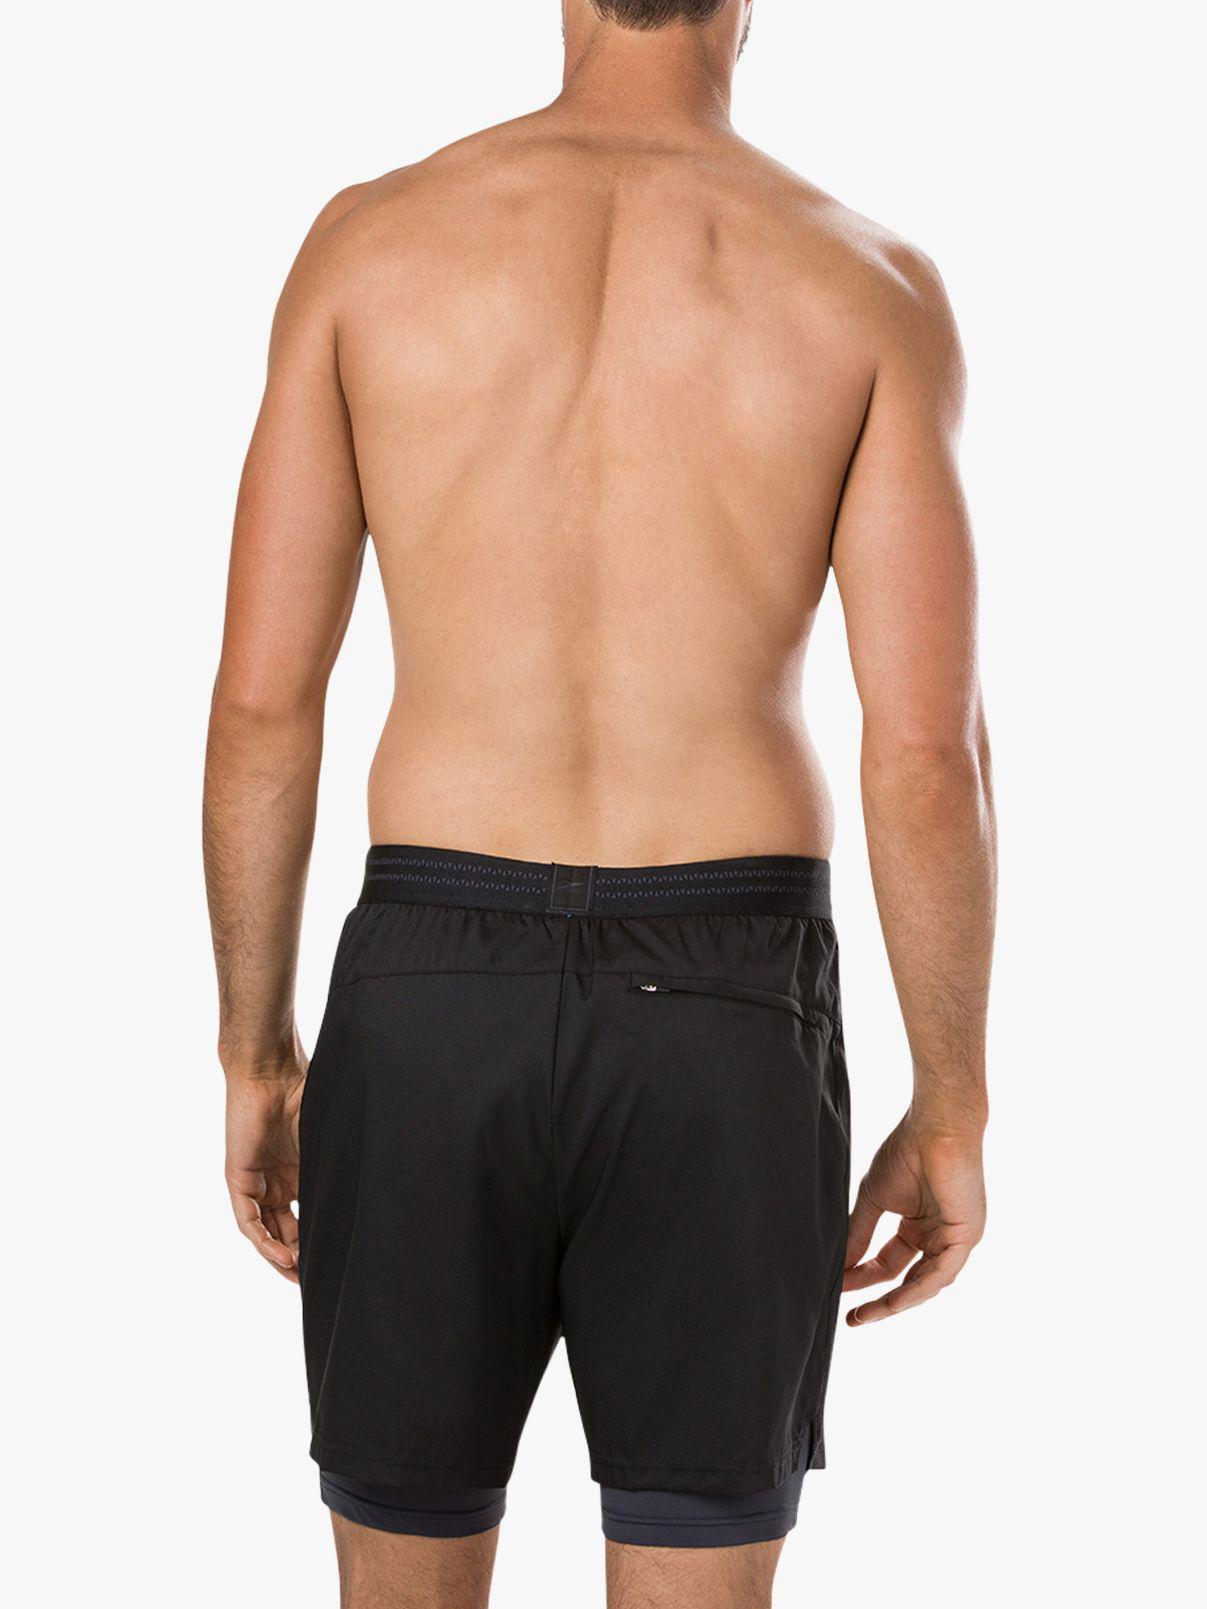 11602eb79b Speedo - Black Reflectwave Flex 2-in-1 Swim Shorts for Men - Lyst. View  fullscreen